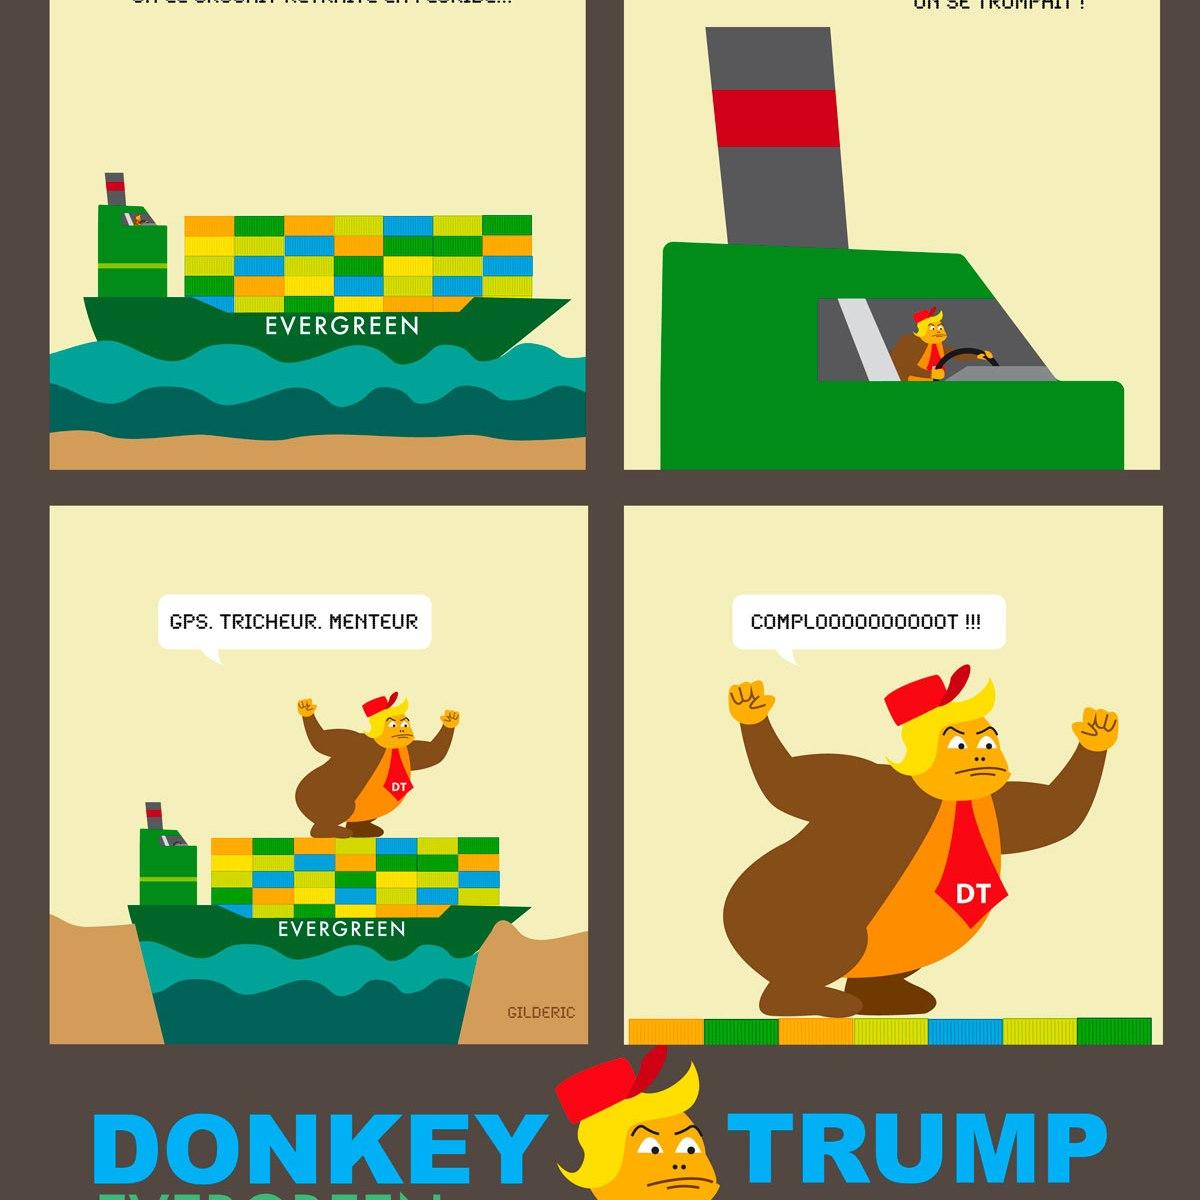 Donkey Trump : Evergreen - parodie de Donkey Trump vs le porte-container d'Evergreen (bd humour)